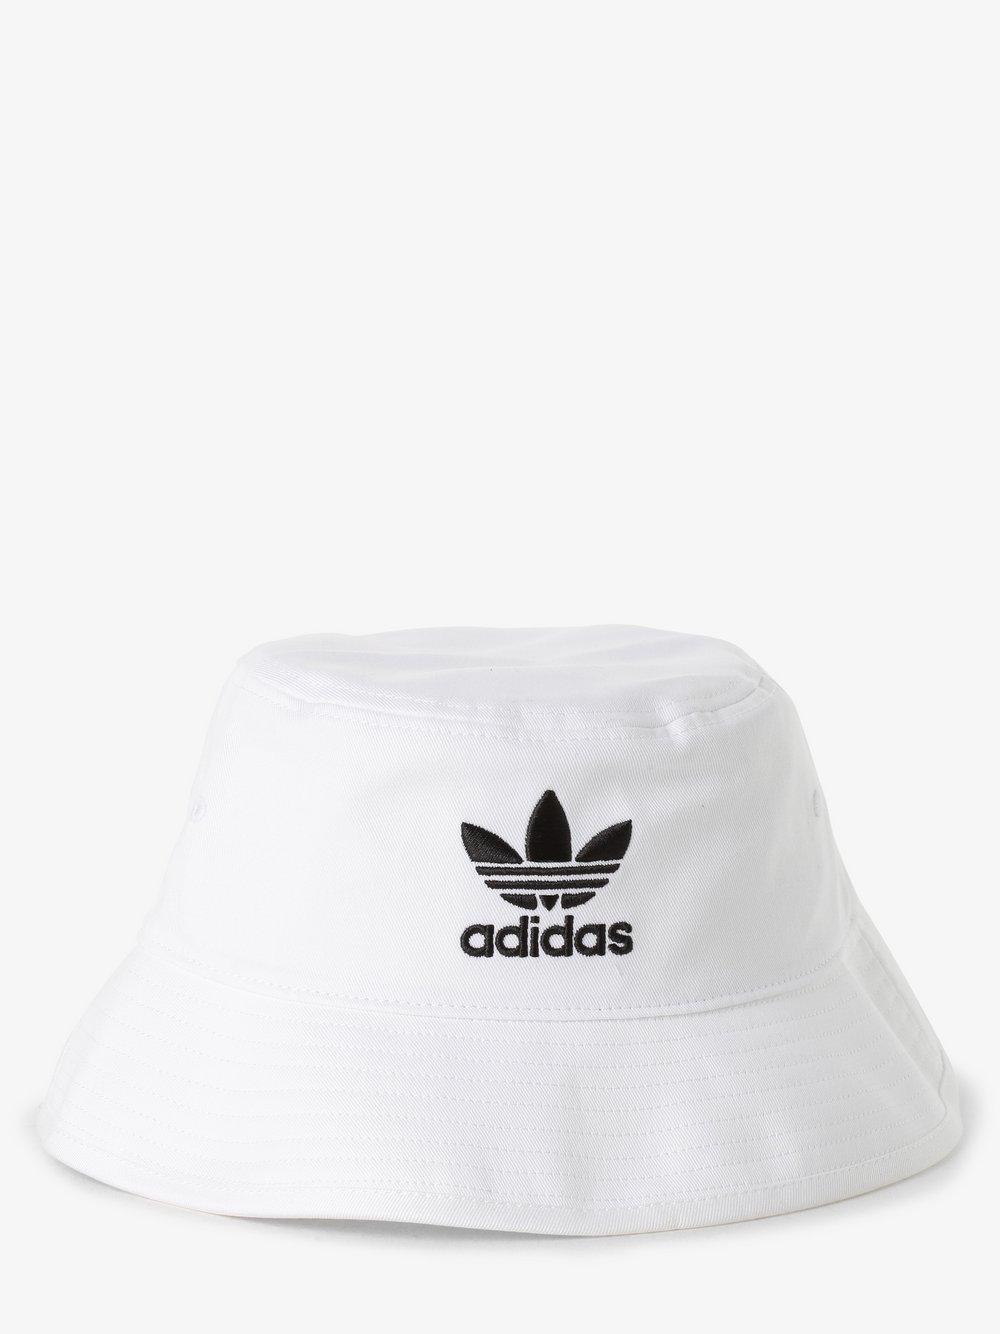 adidas Originals - Kapelusz damski, biały